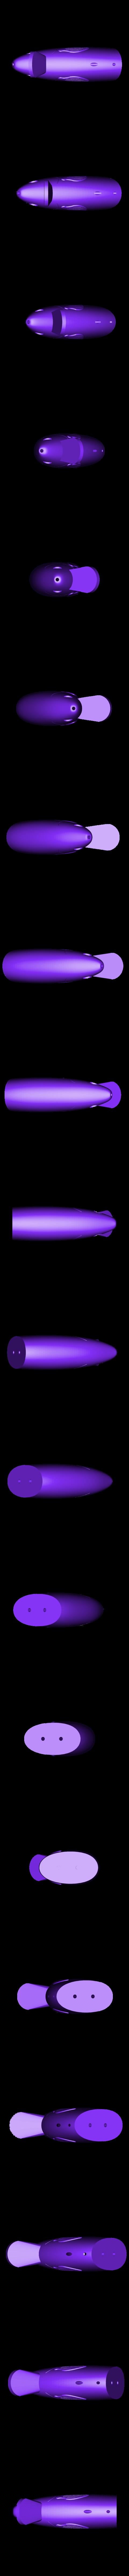 Head_Swimbait_Line_thru.stl Download free STL file Swimbait/Glidebait Line Thru Heads • 3D printing template, Domi1988